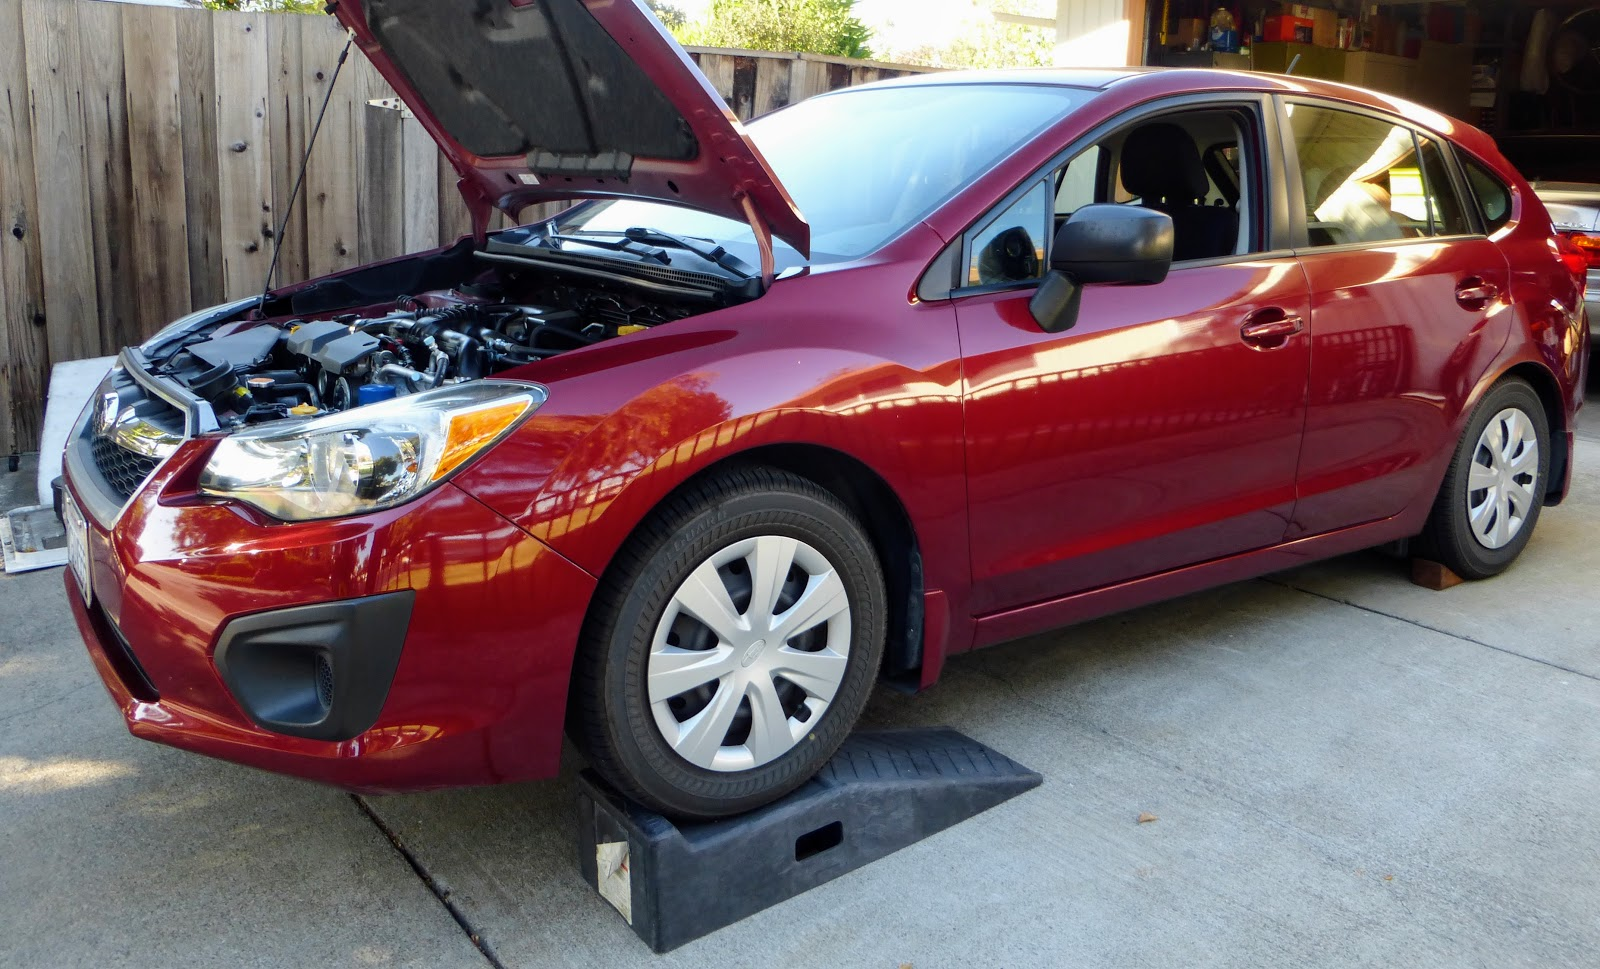 Paolo Baltar 2012 Subaru Impreza Engine Oil Change Diagram Tip